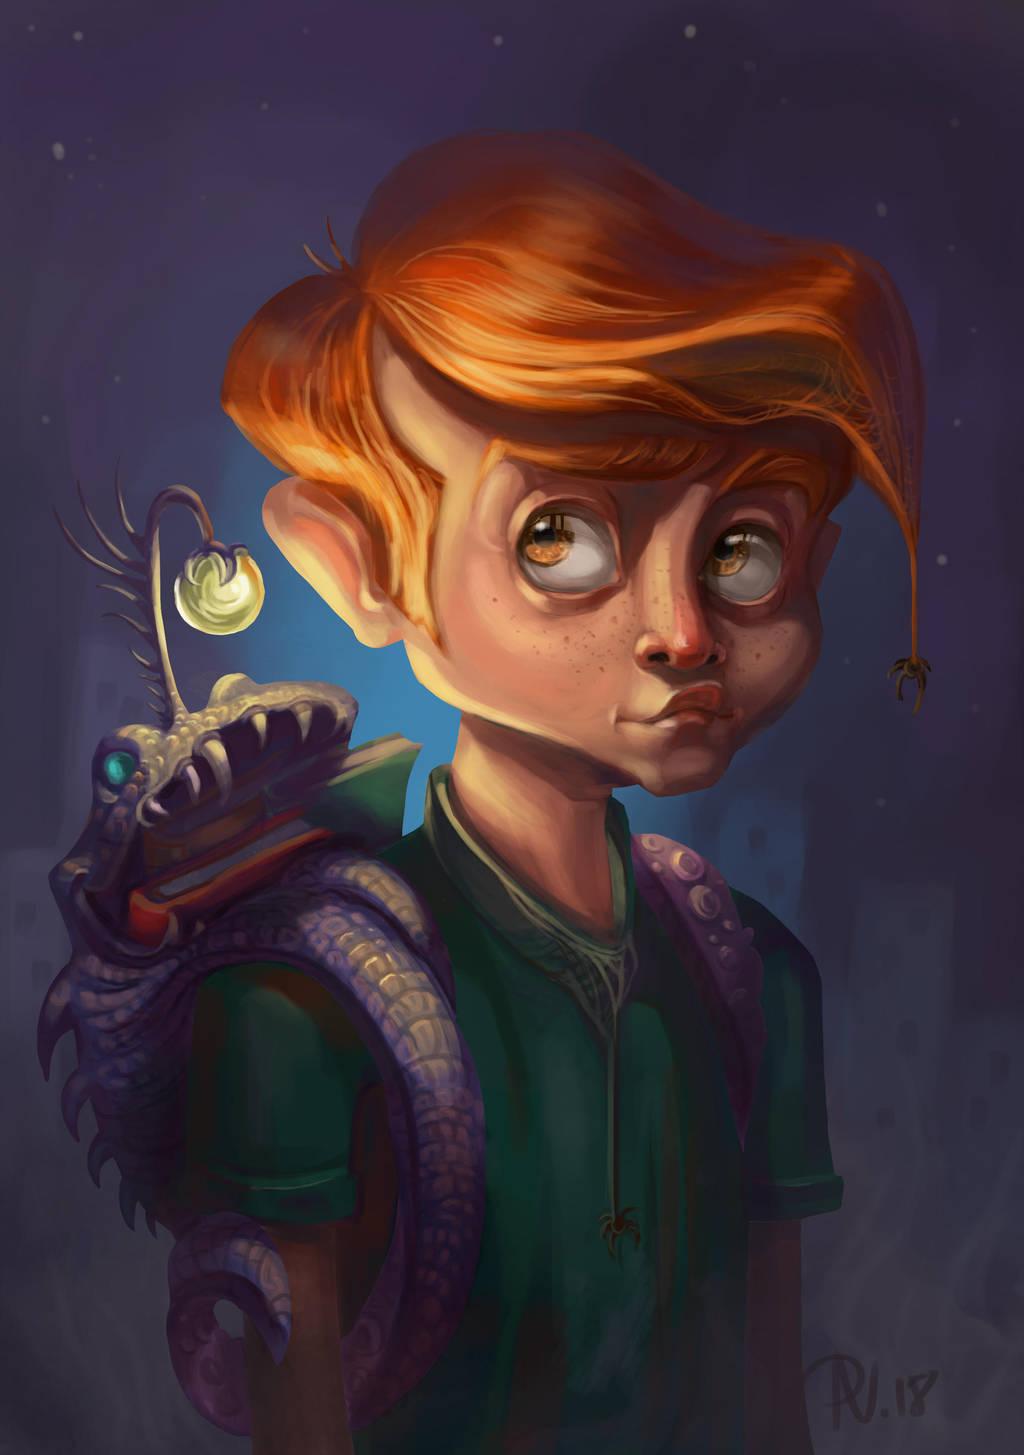 Night School Boy by RosieVangelova